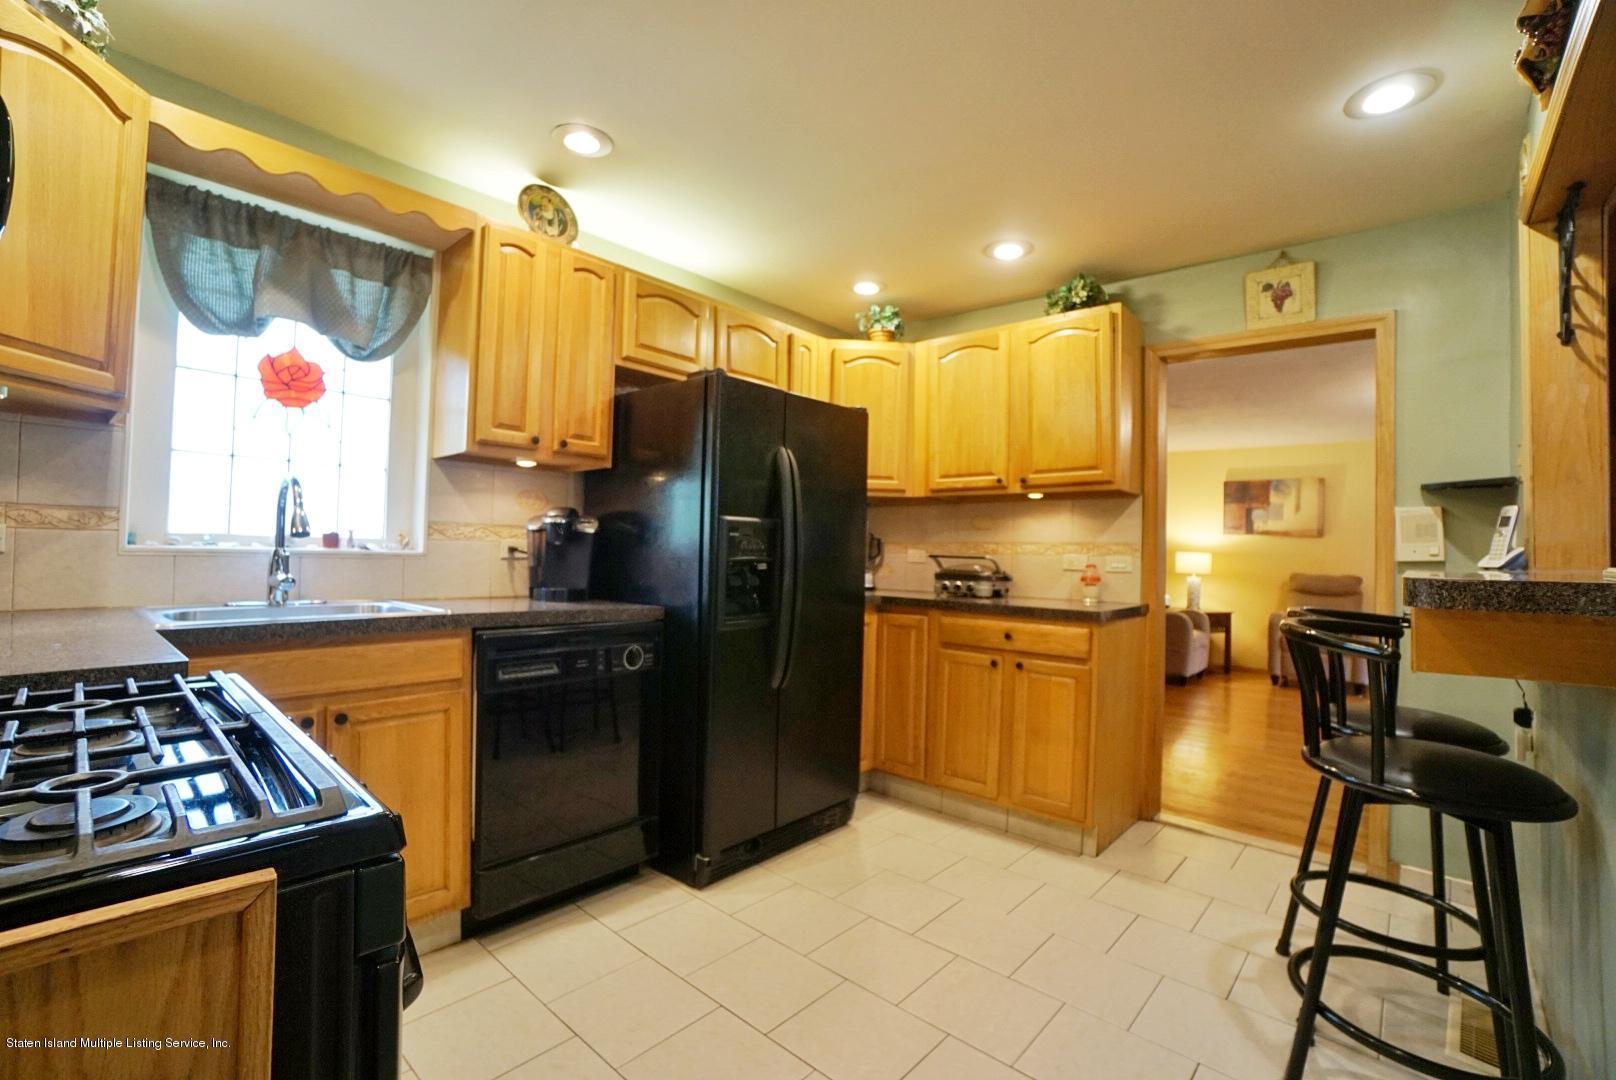 Single Family - Detached 42-44 Oceanic Avenue  Staten Island, NY 10312, MLS-1132674-8